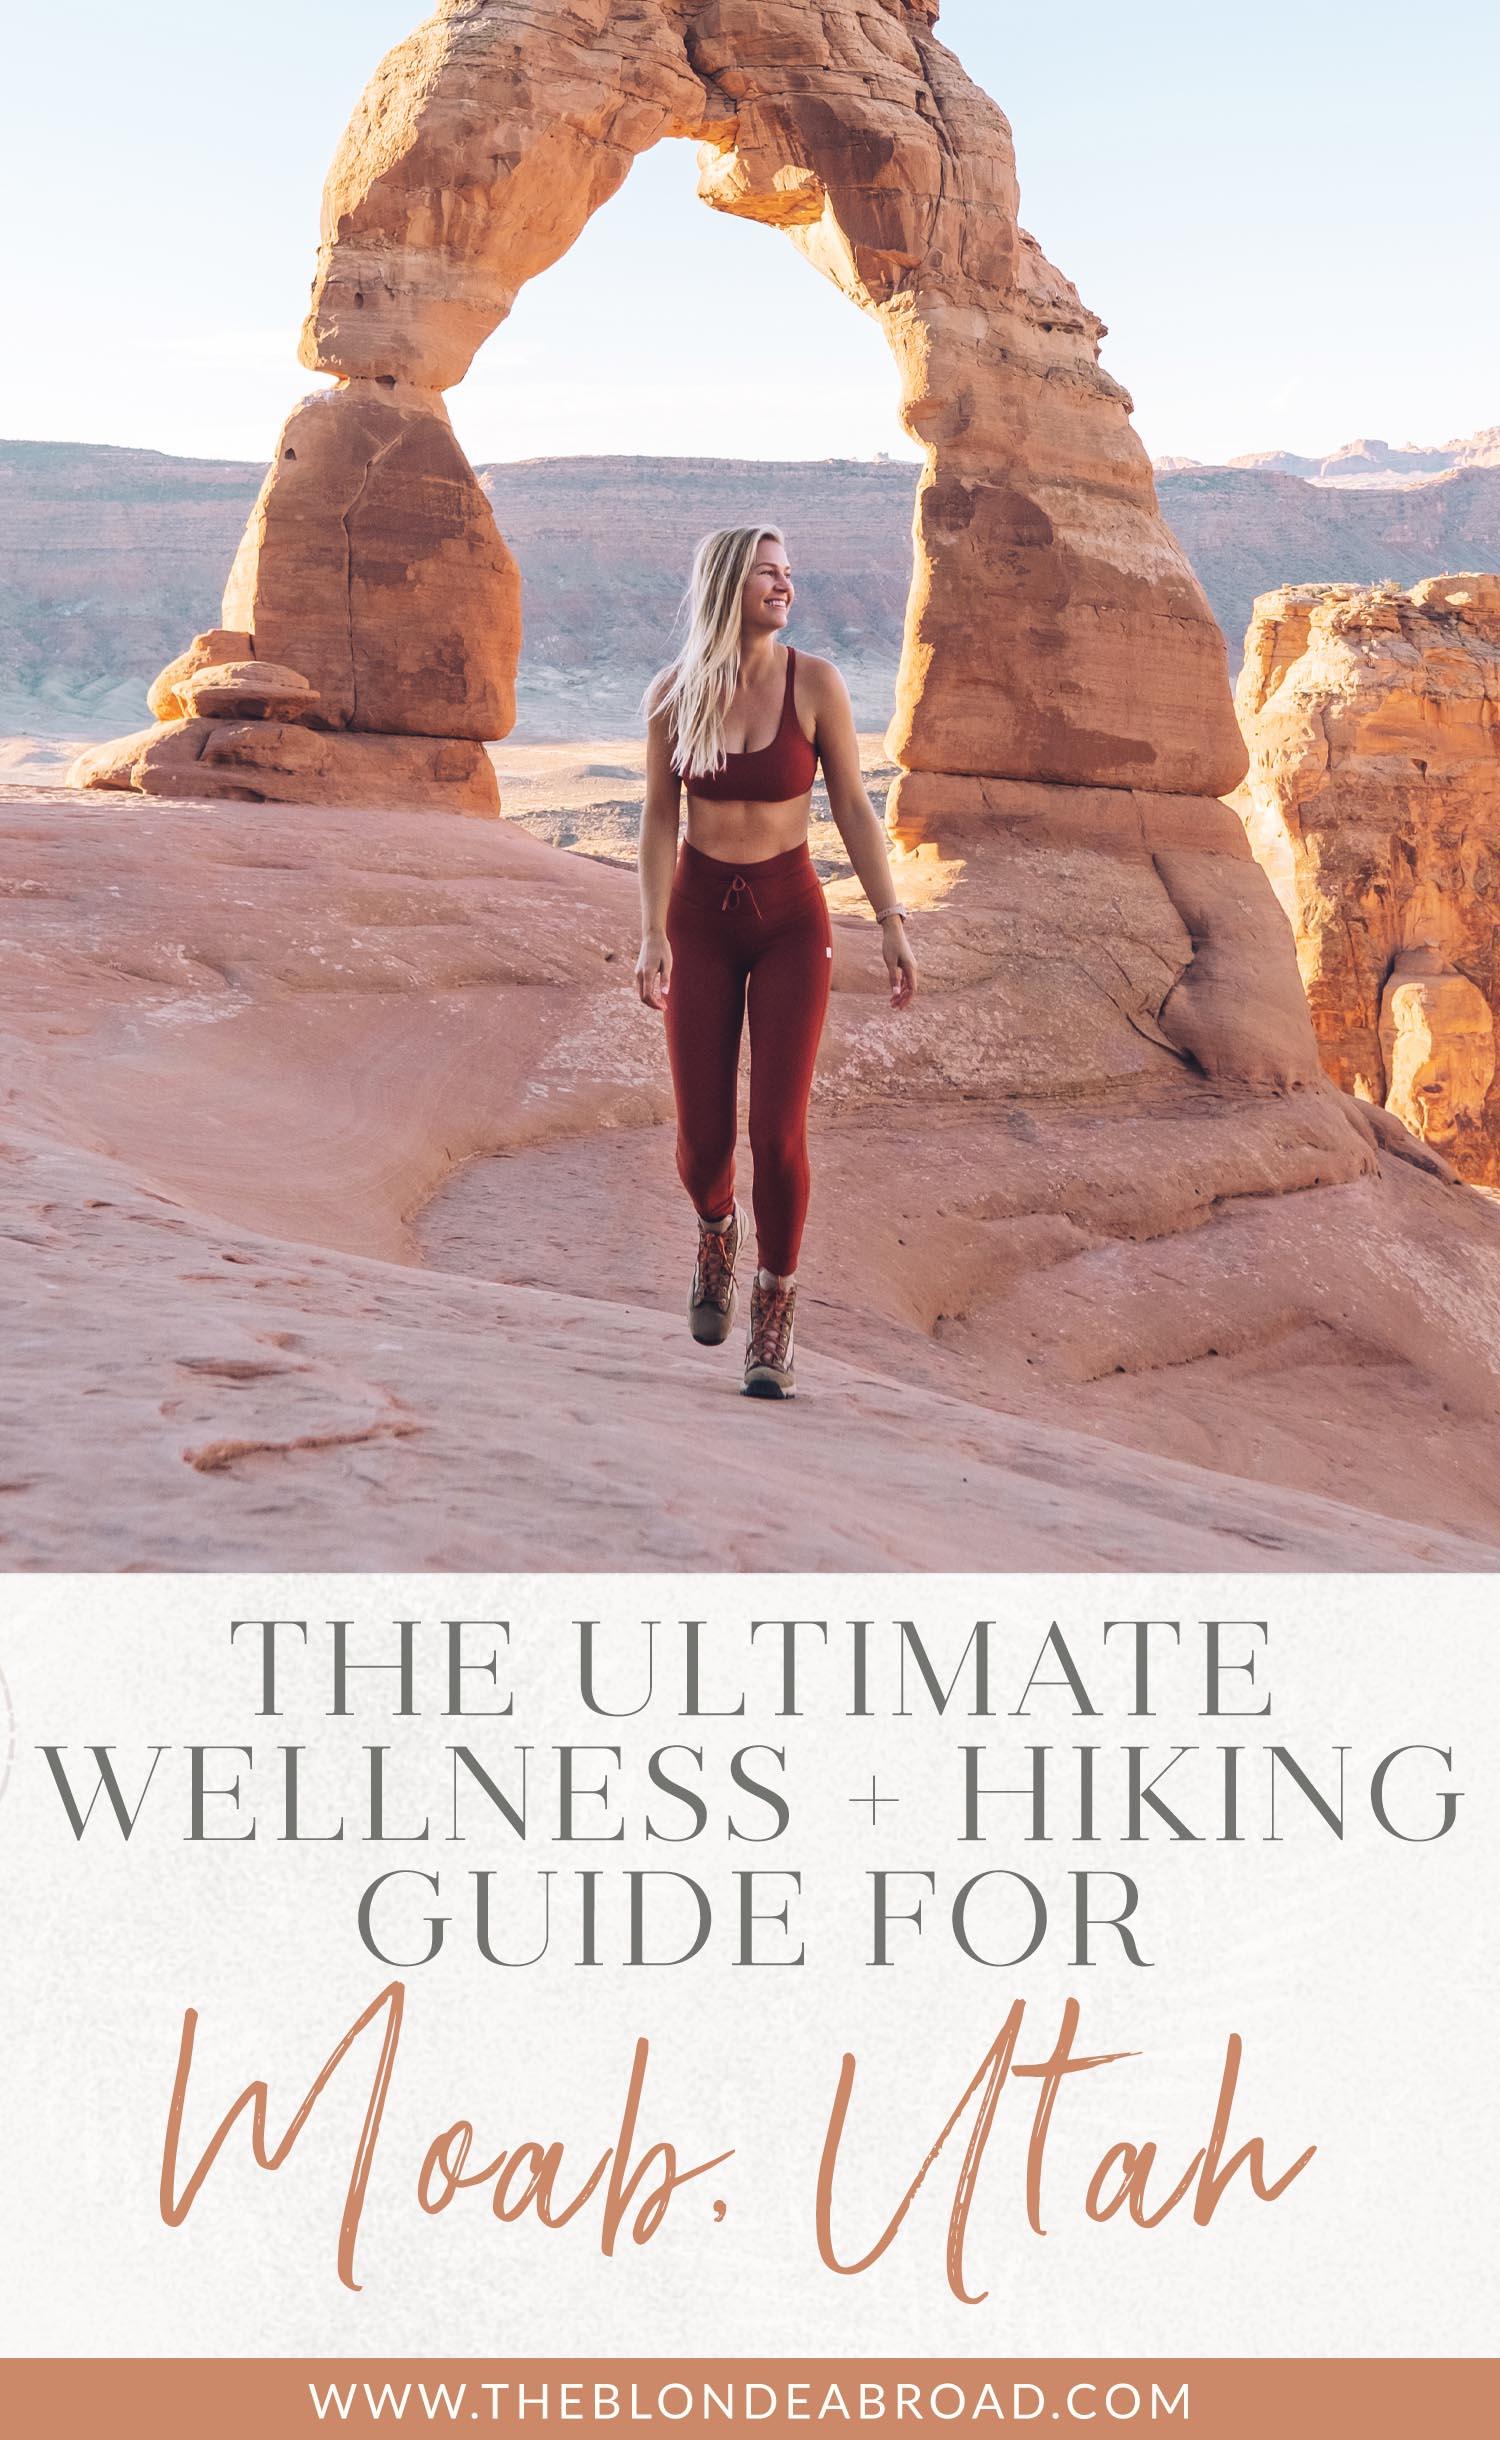 Ulimate Wellness Caminhadas Guia Moab Utah